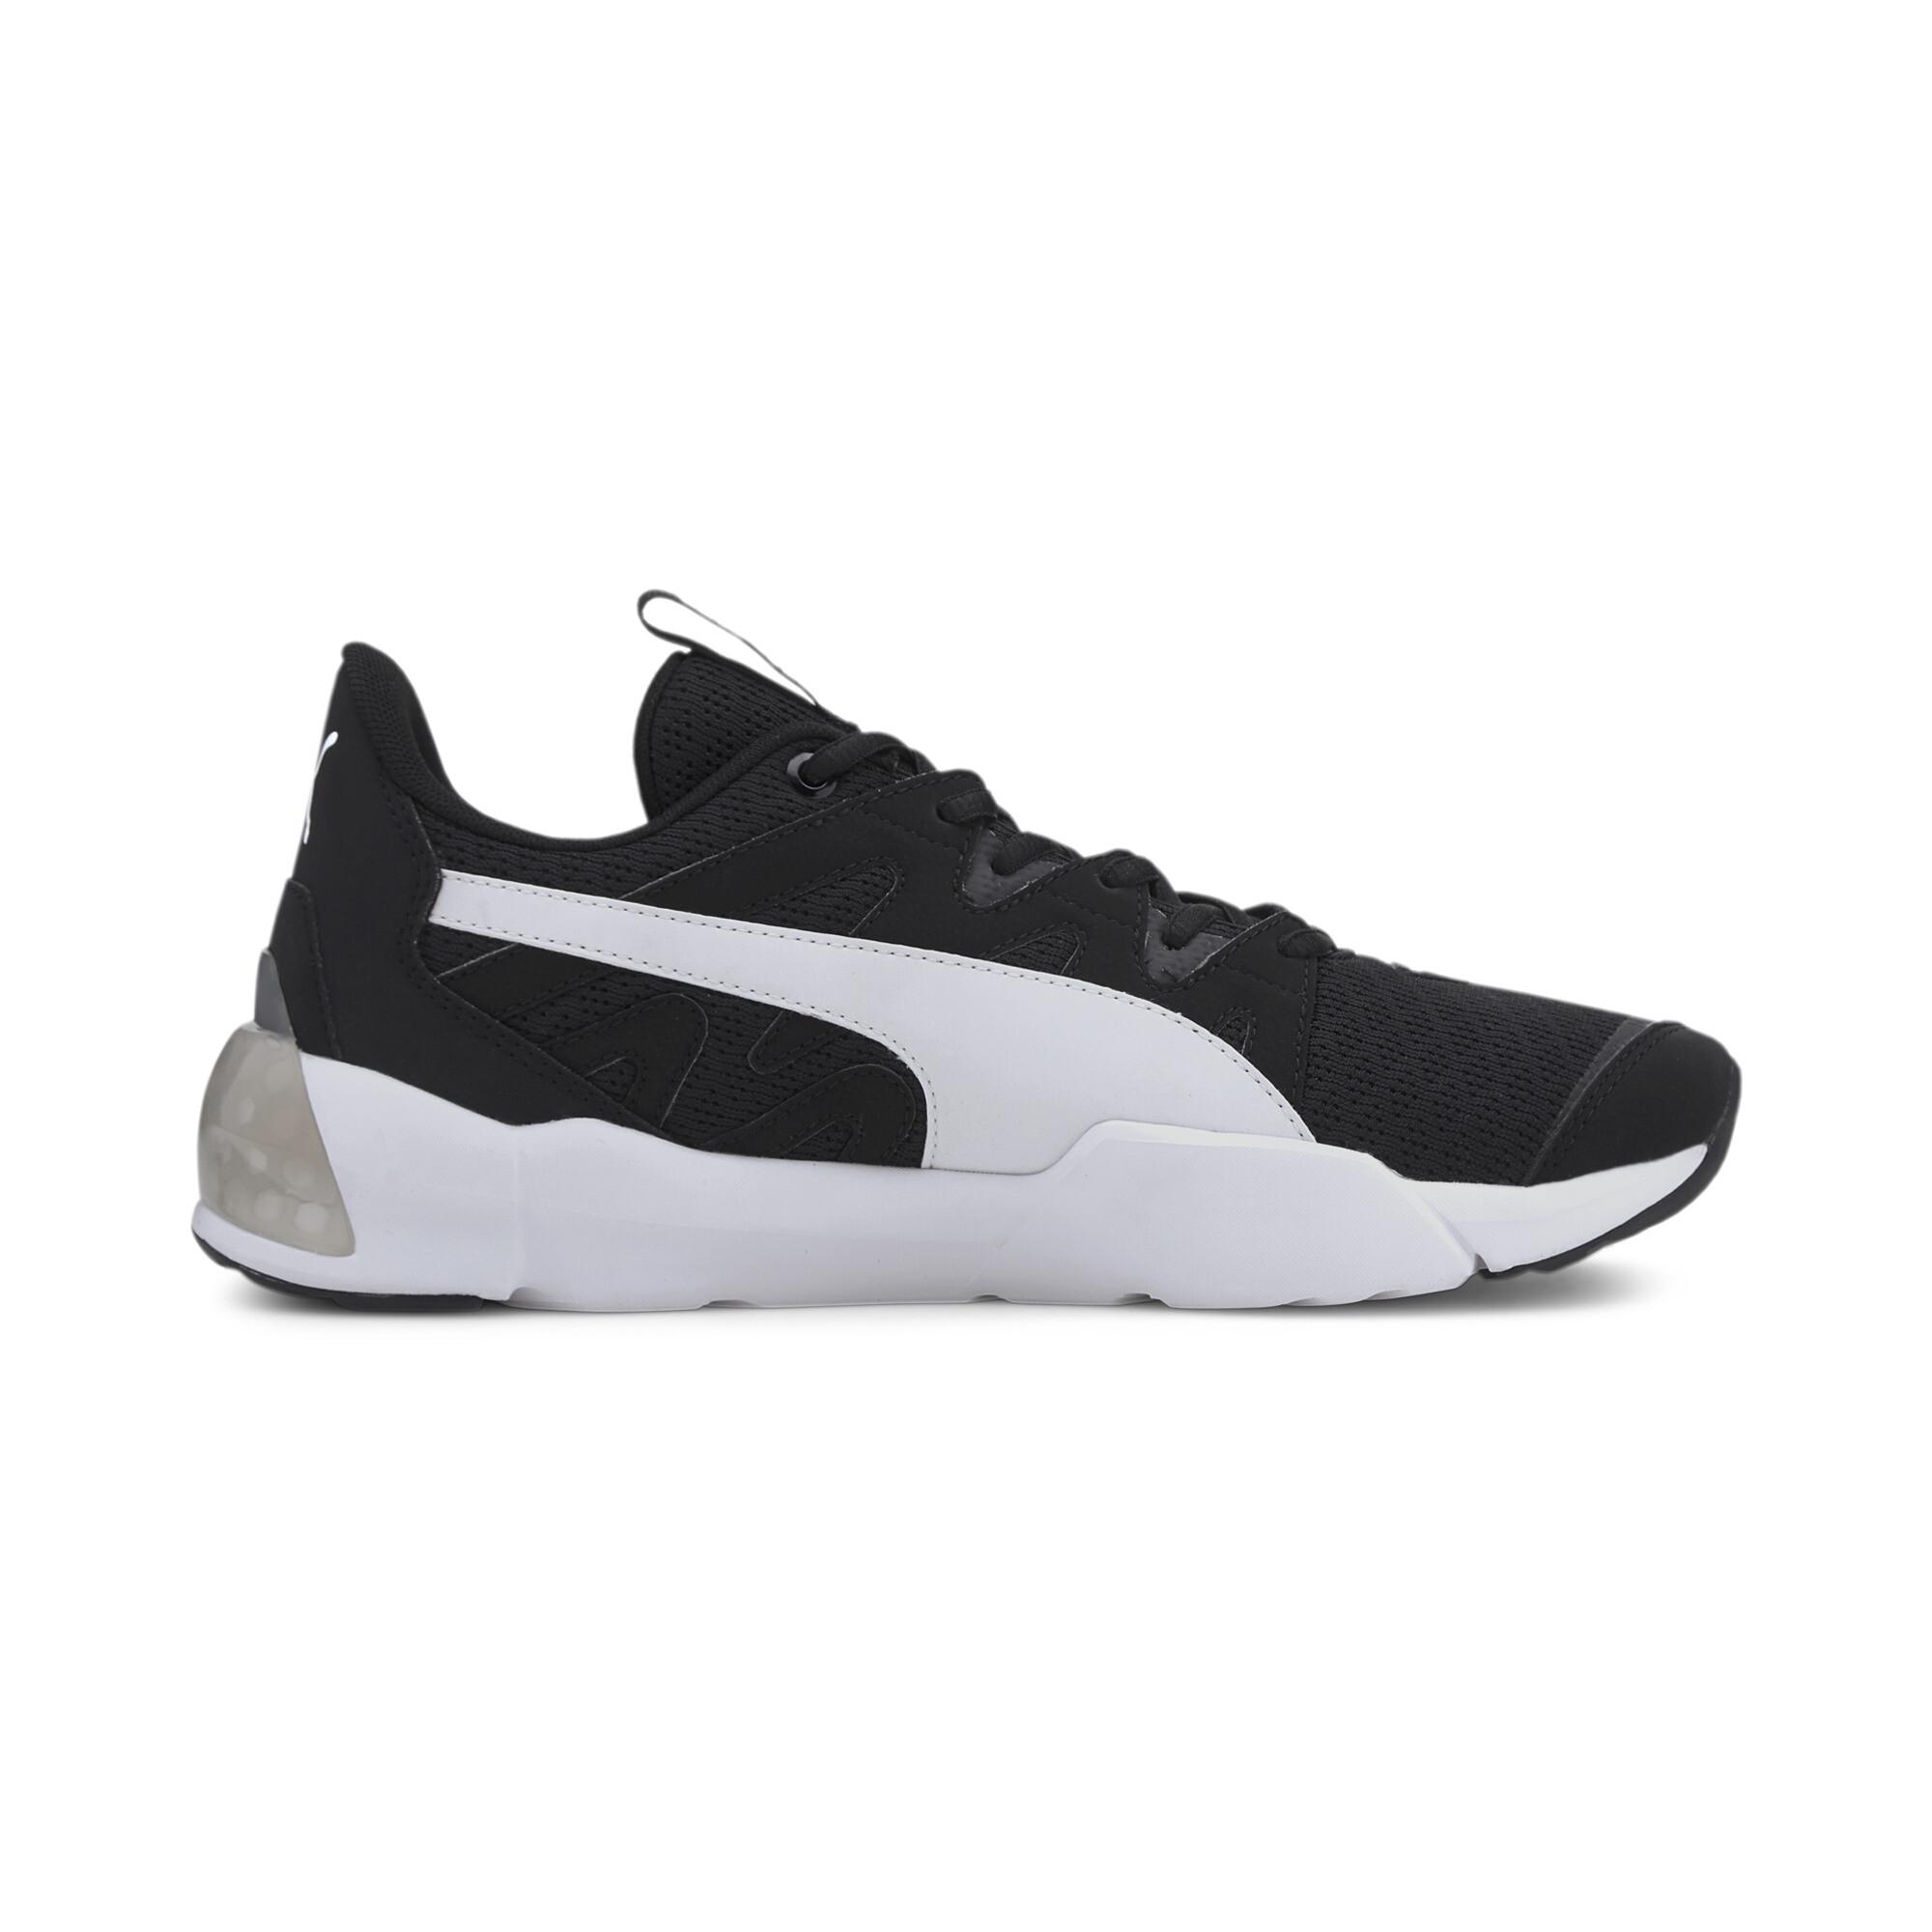 thumbnail 8 - PUMA Men's CELL Pharos Training Shoes